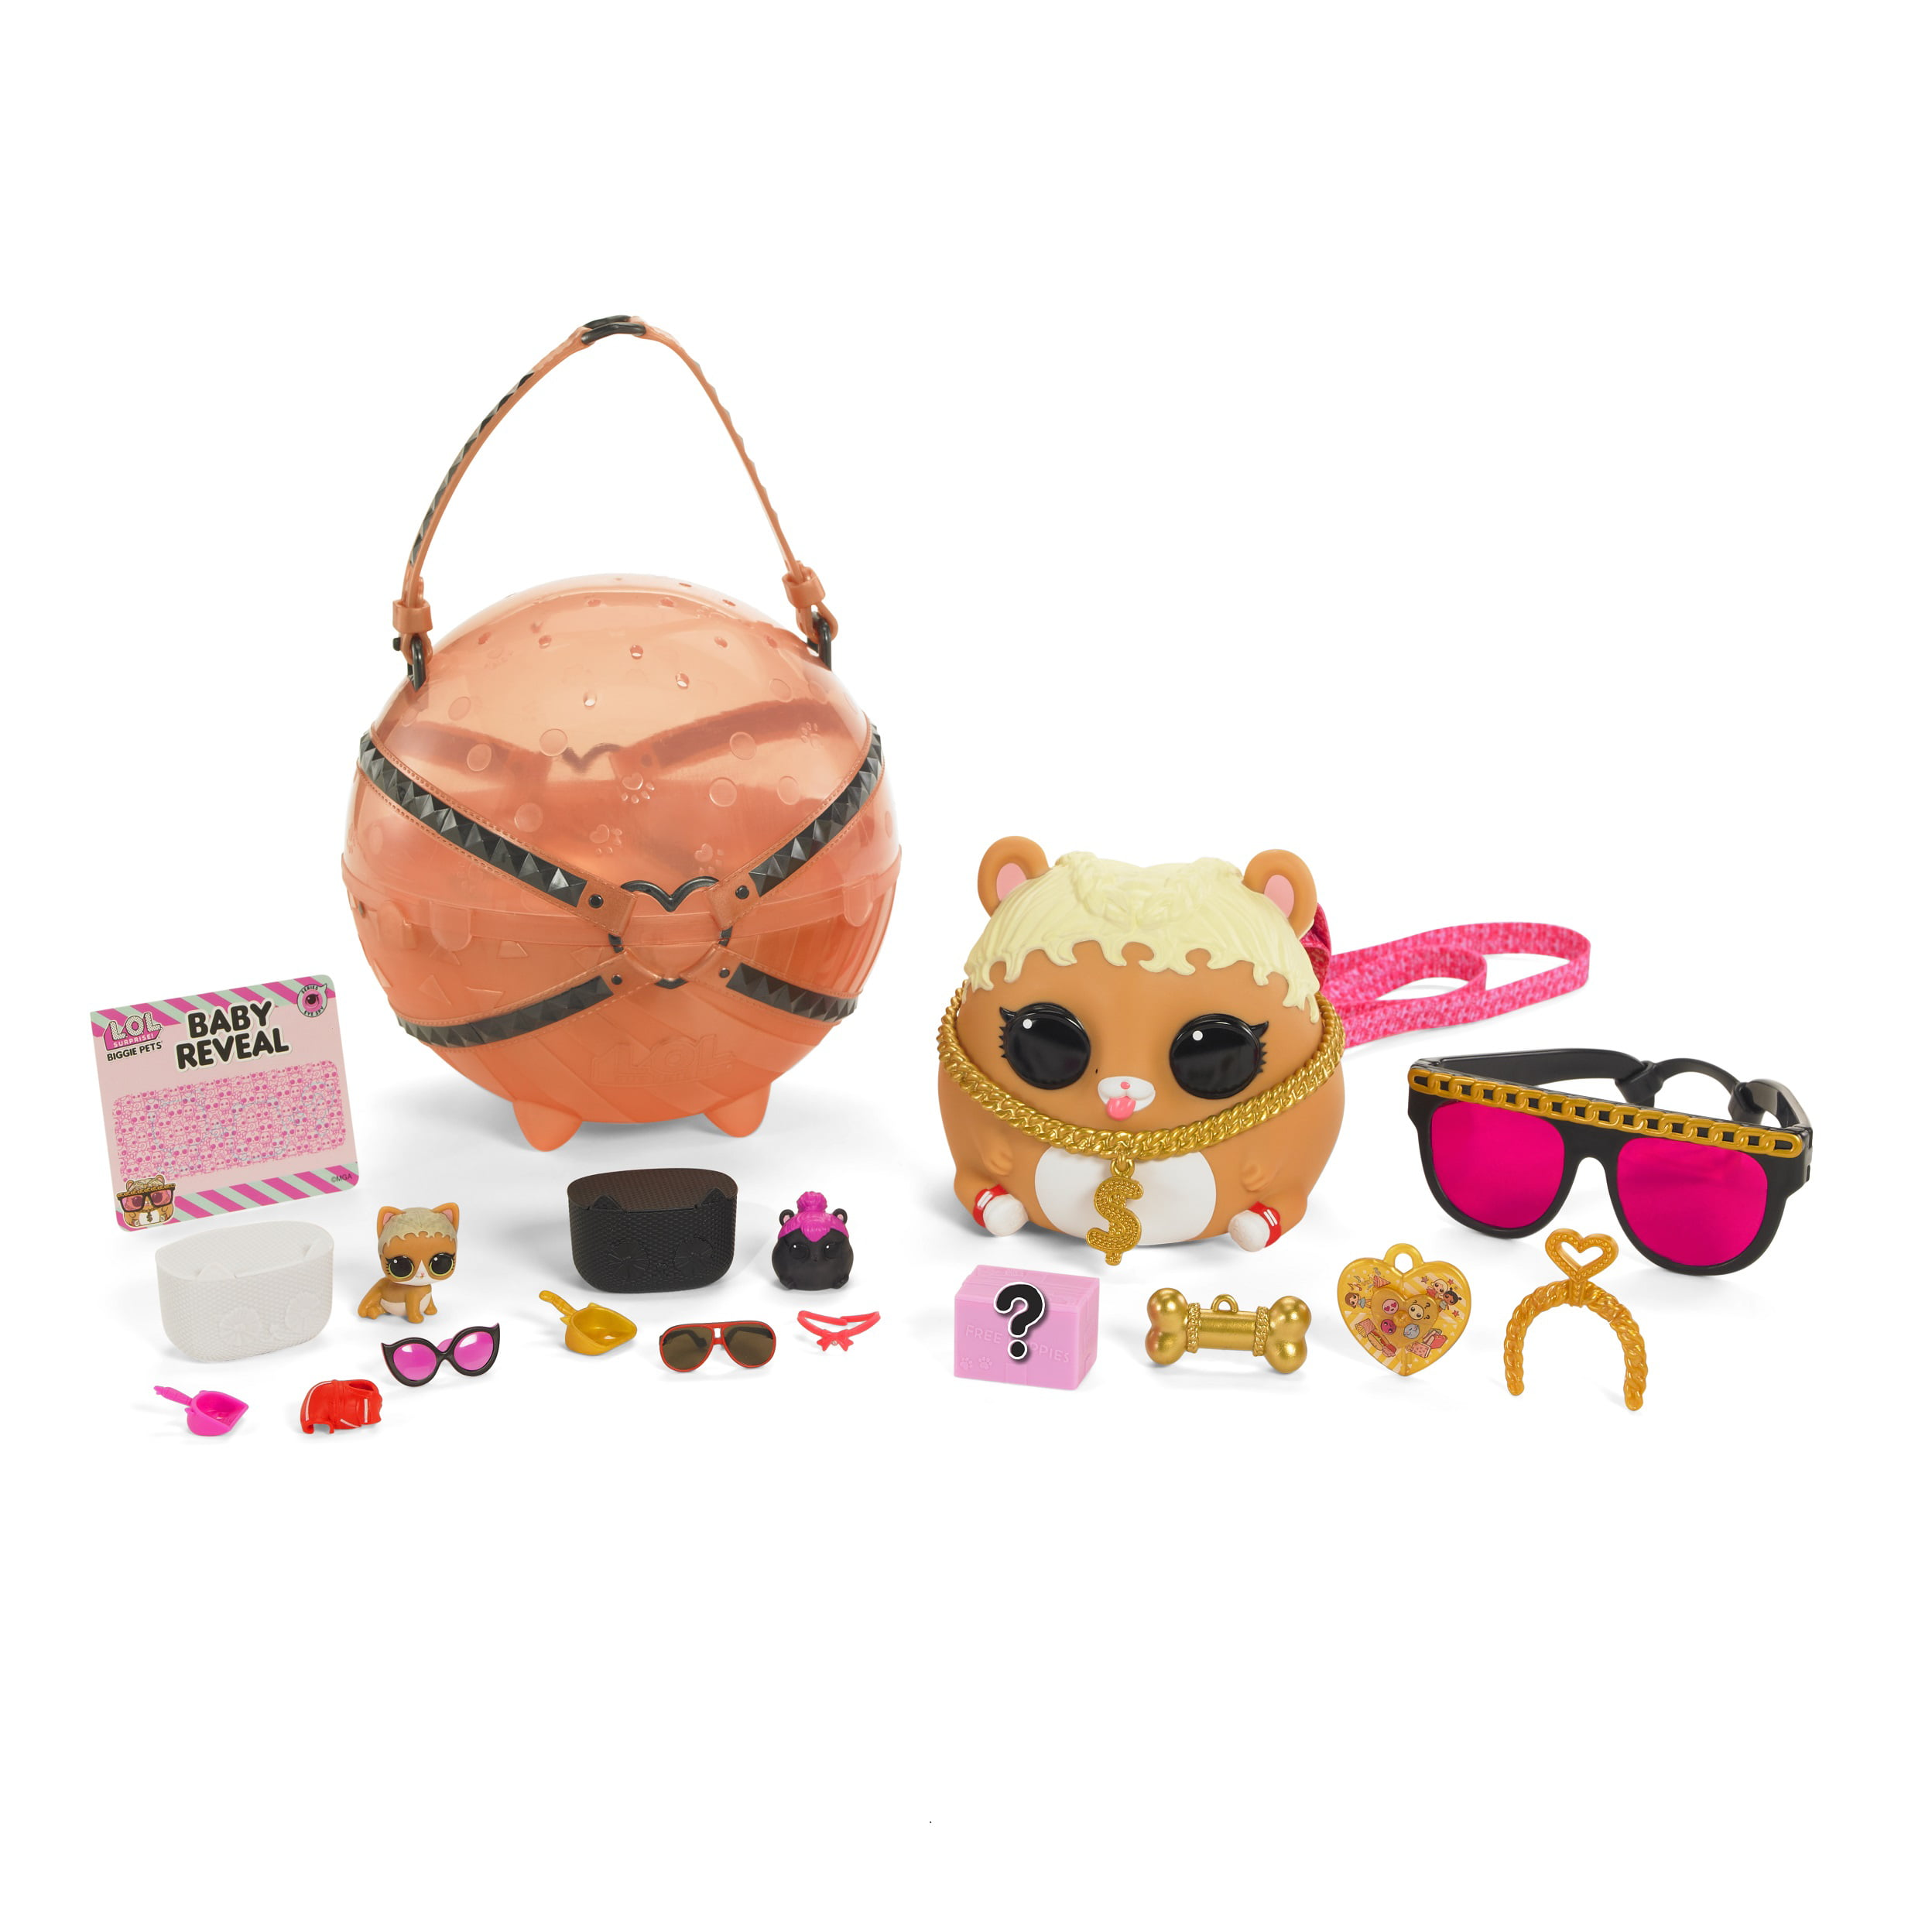 Surprise MC Hammy Mini Backpack Toy NEW WITH BOX DAMAGE Biggie Pets L.O.L